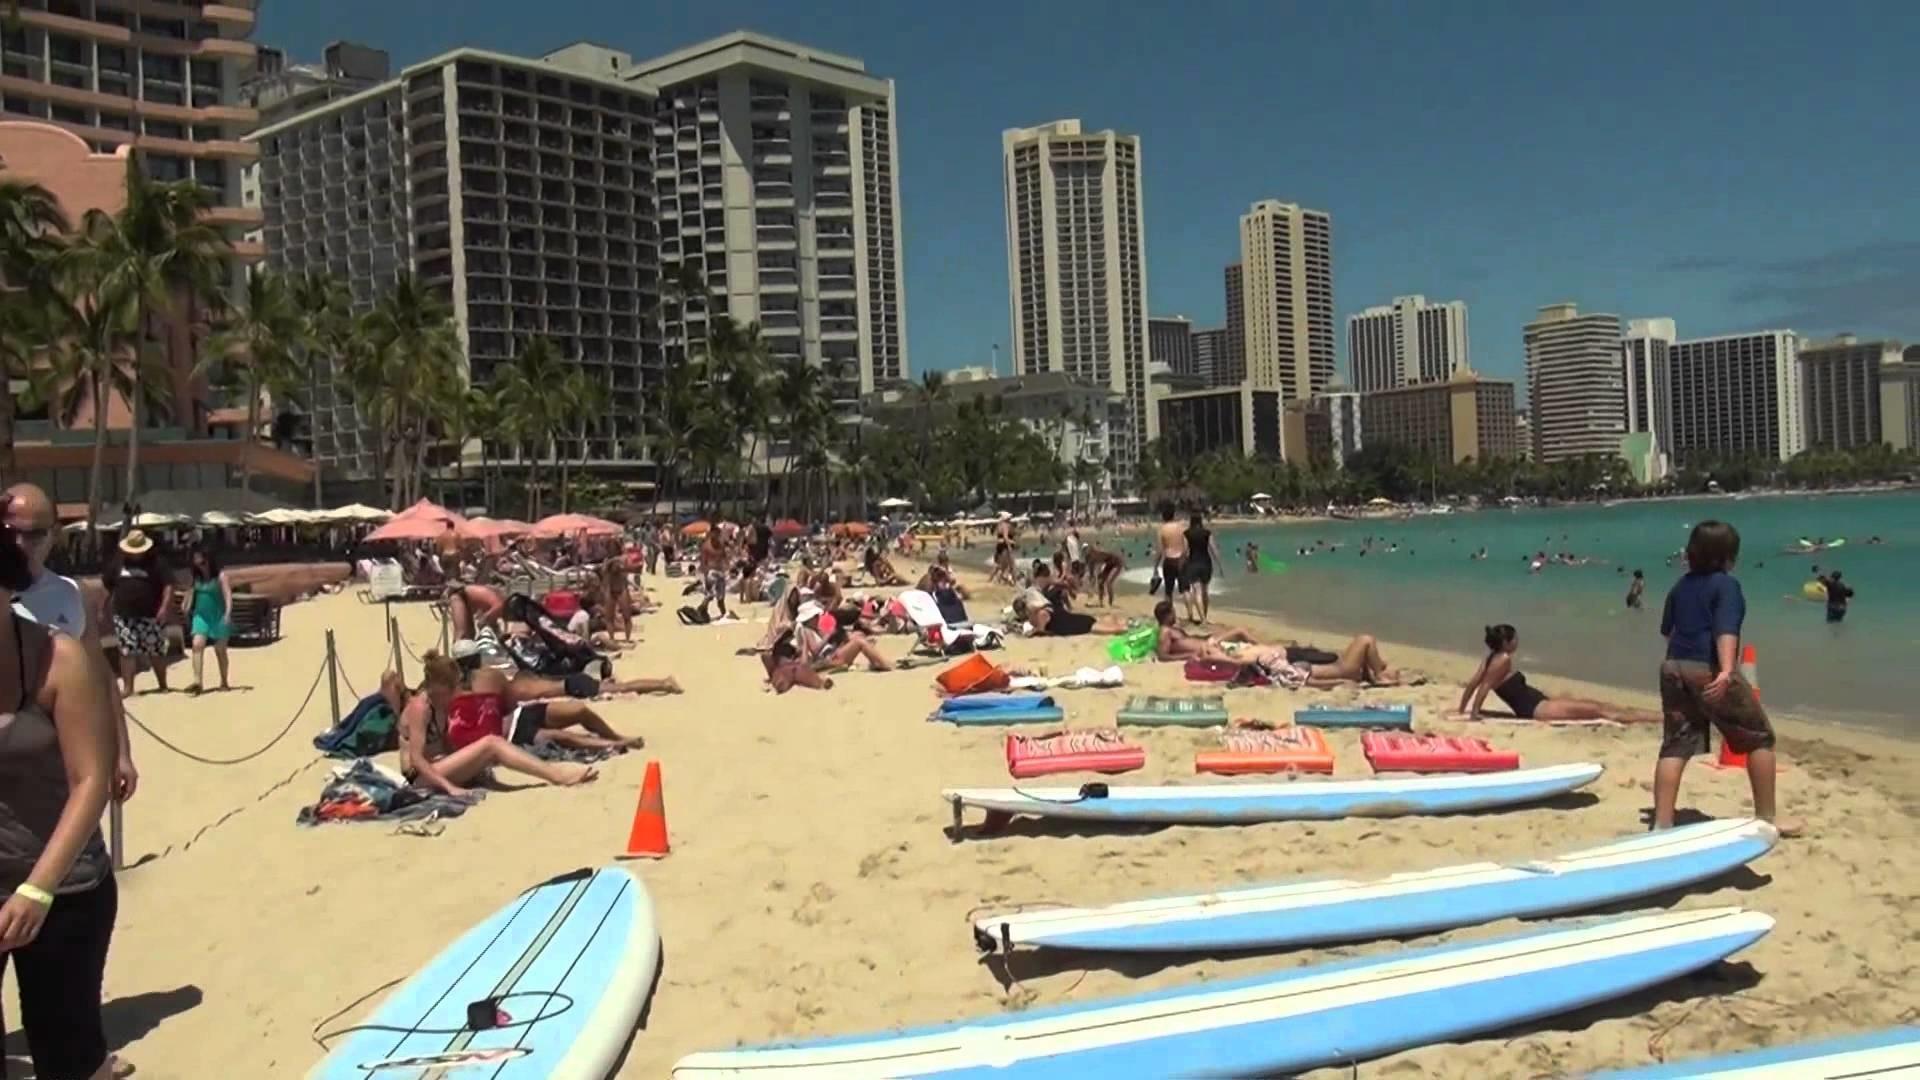 Res: 1920x1080, Take a Walk Down Waikiki Beach